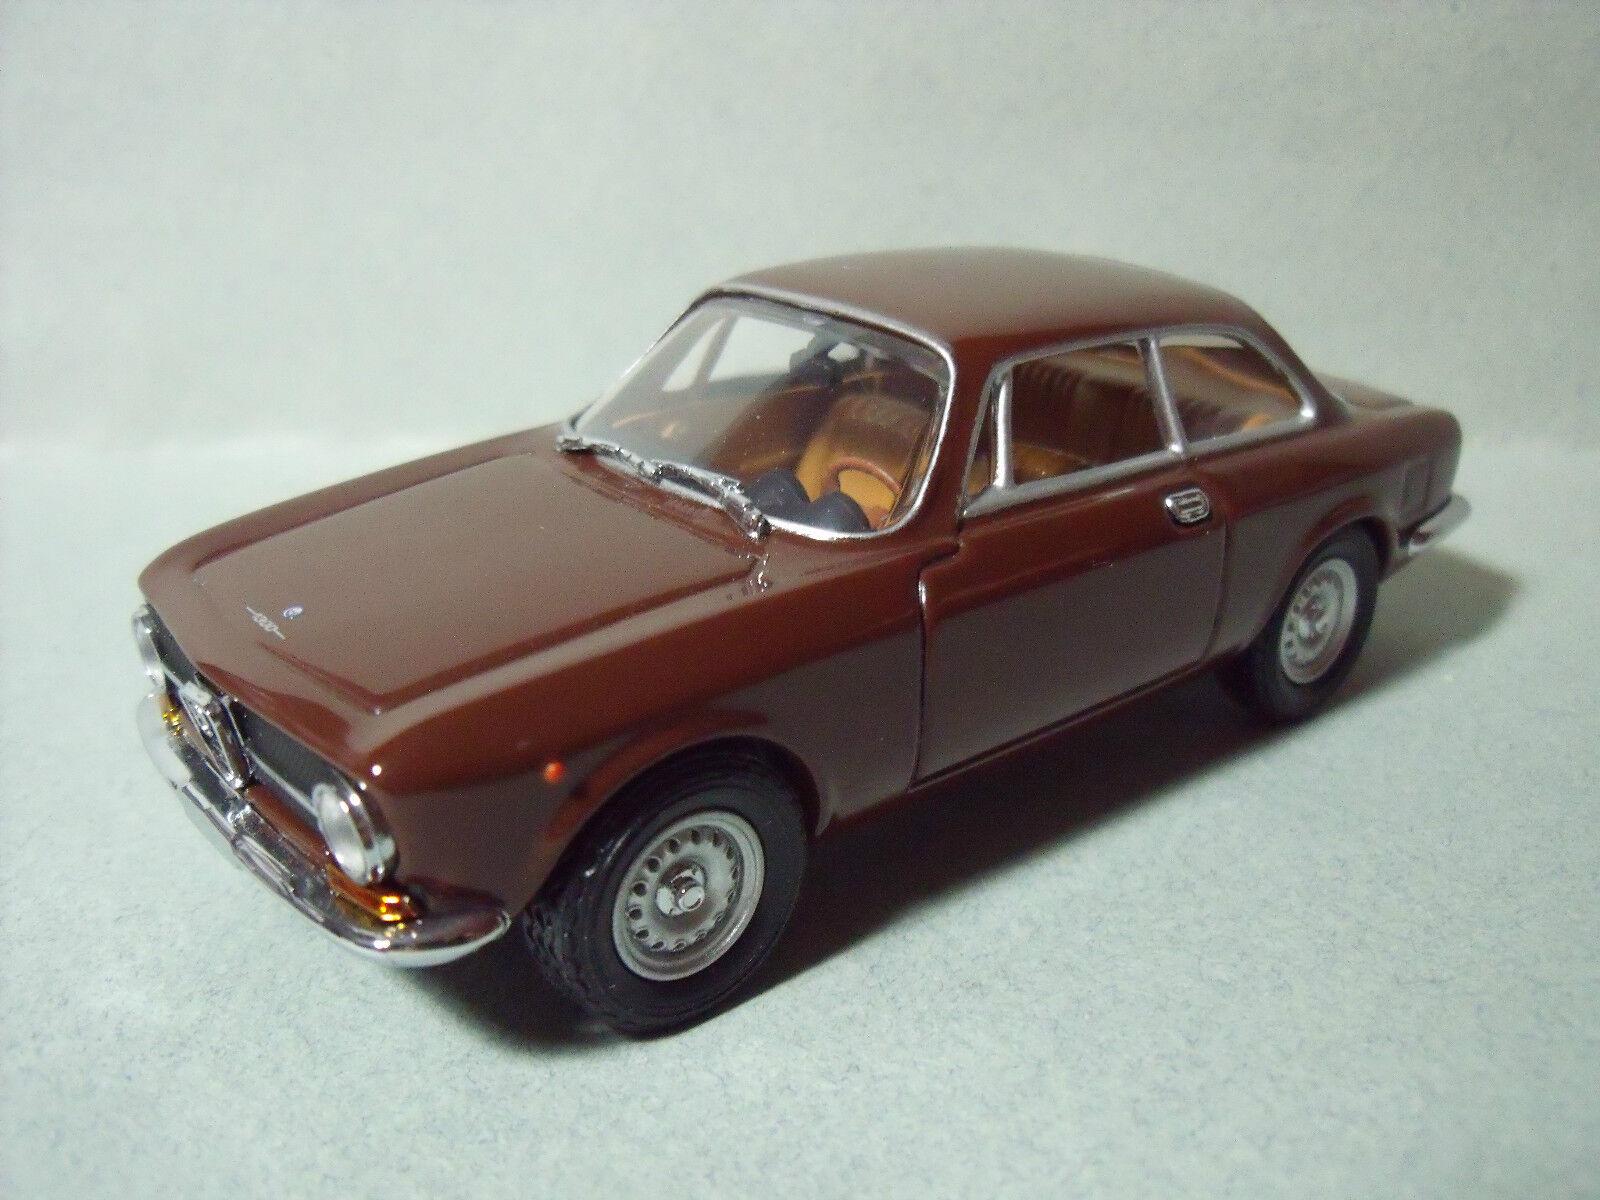 ALFA  ROMEO  1300  JUNIOR  COUPE  1969  DETAIL  CARS   1 43